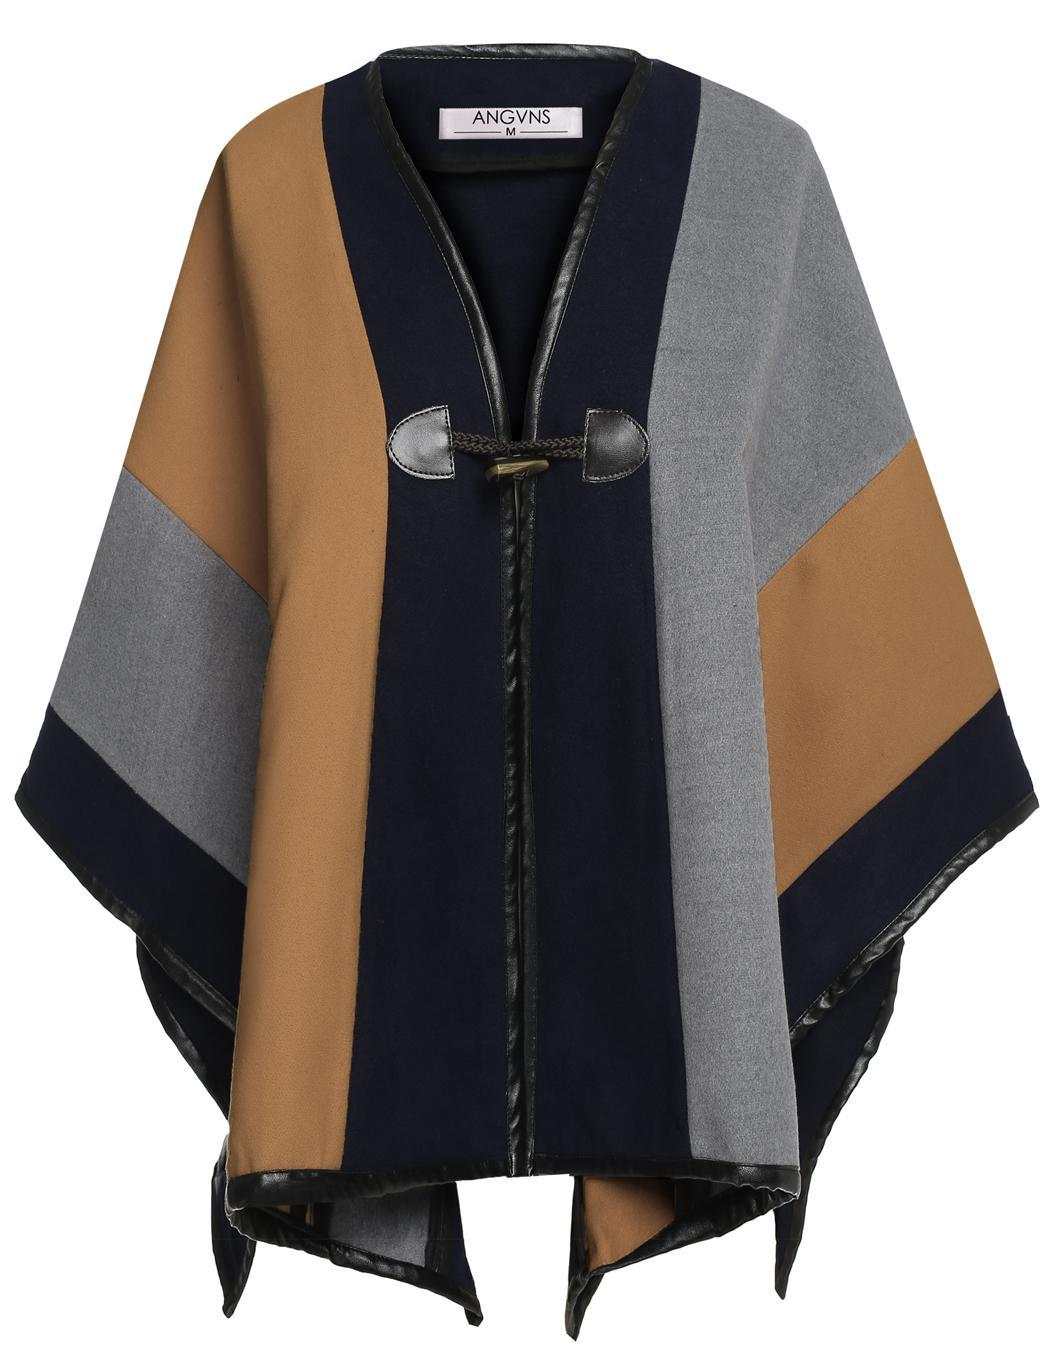 Angvns Women Patchwork Wrap Shawl Cape Casual Poncho Cloak ...